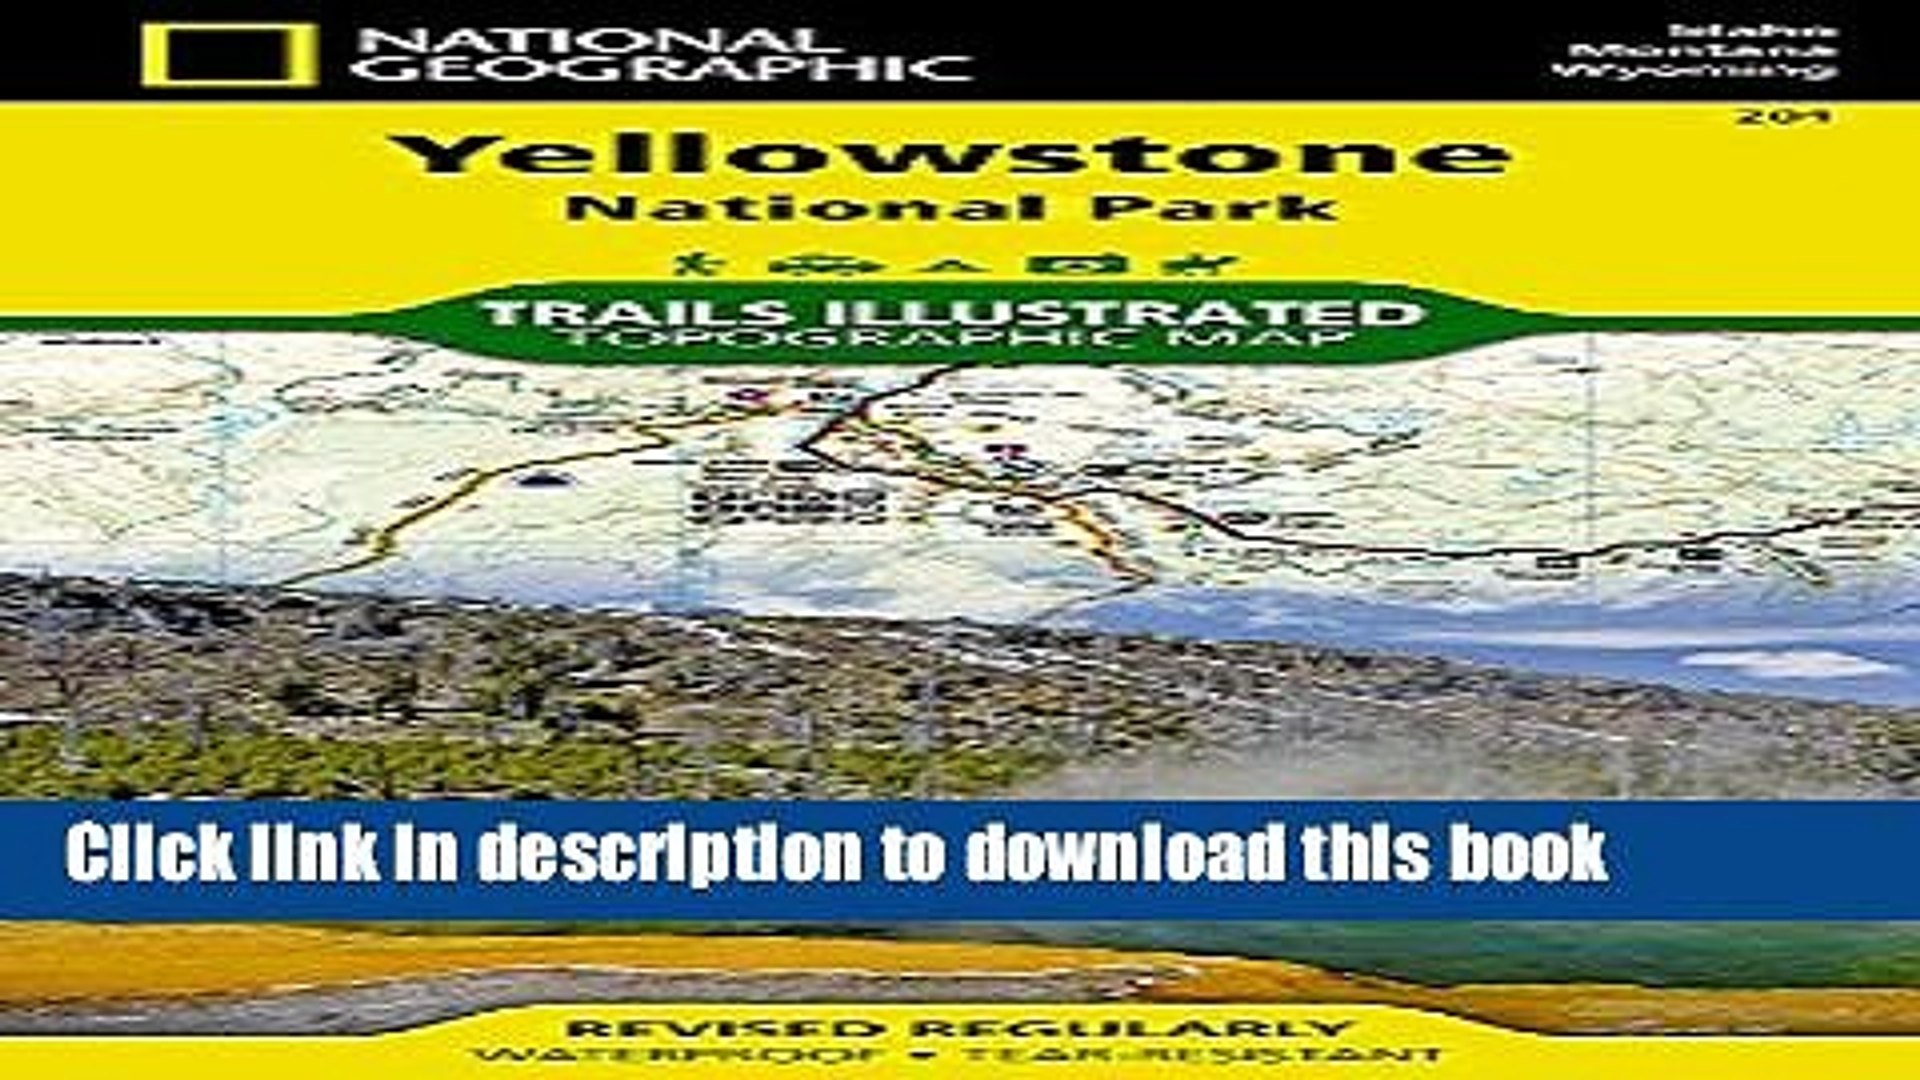 [Popular] Yellowstone National Park 201 GPS Wyoming-Montana-Idaho: Ng.NP.201 Hardcover Free